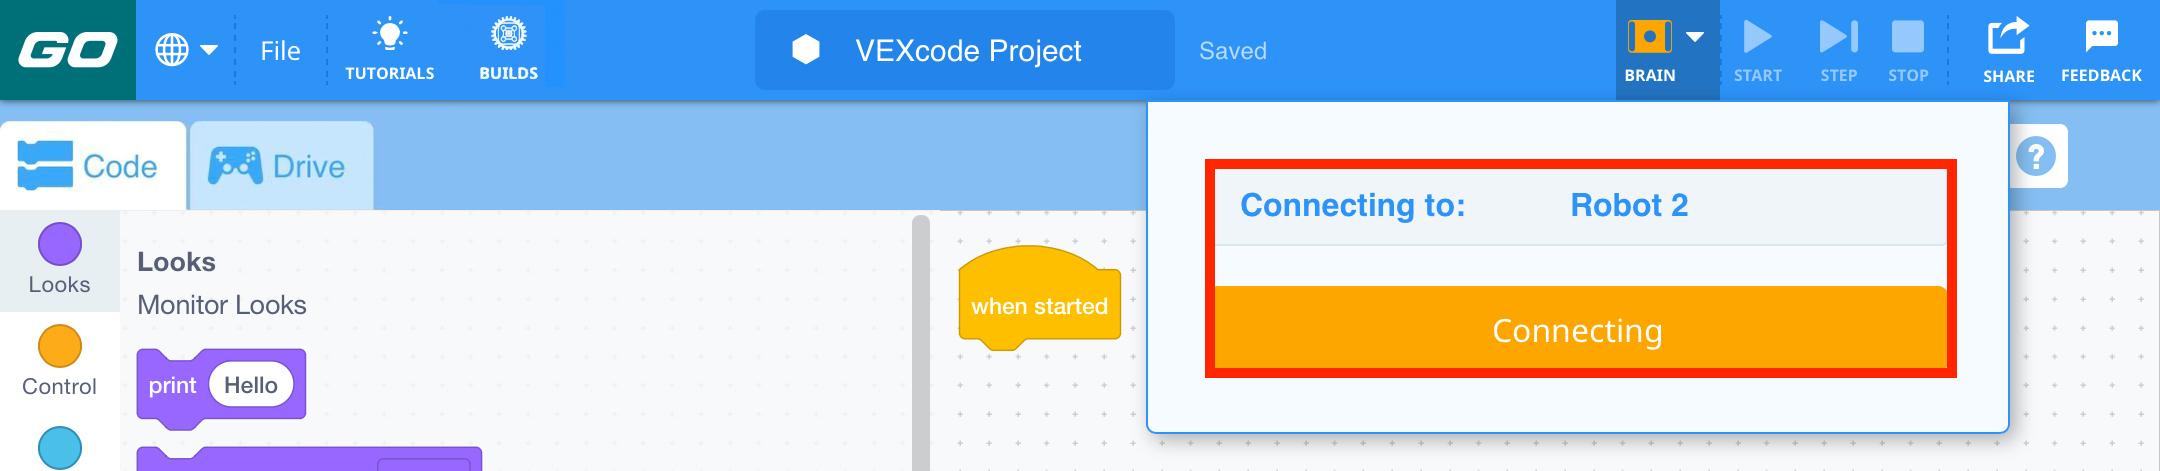 Status_connecting.jpeg